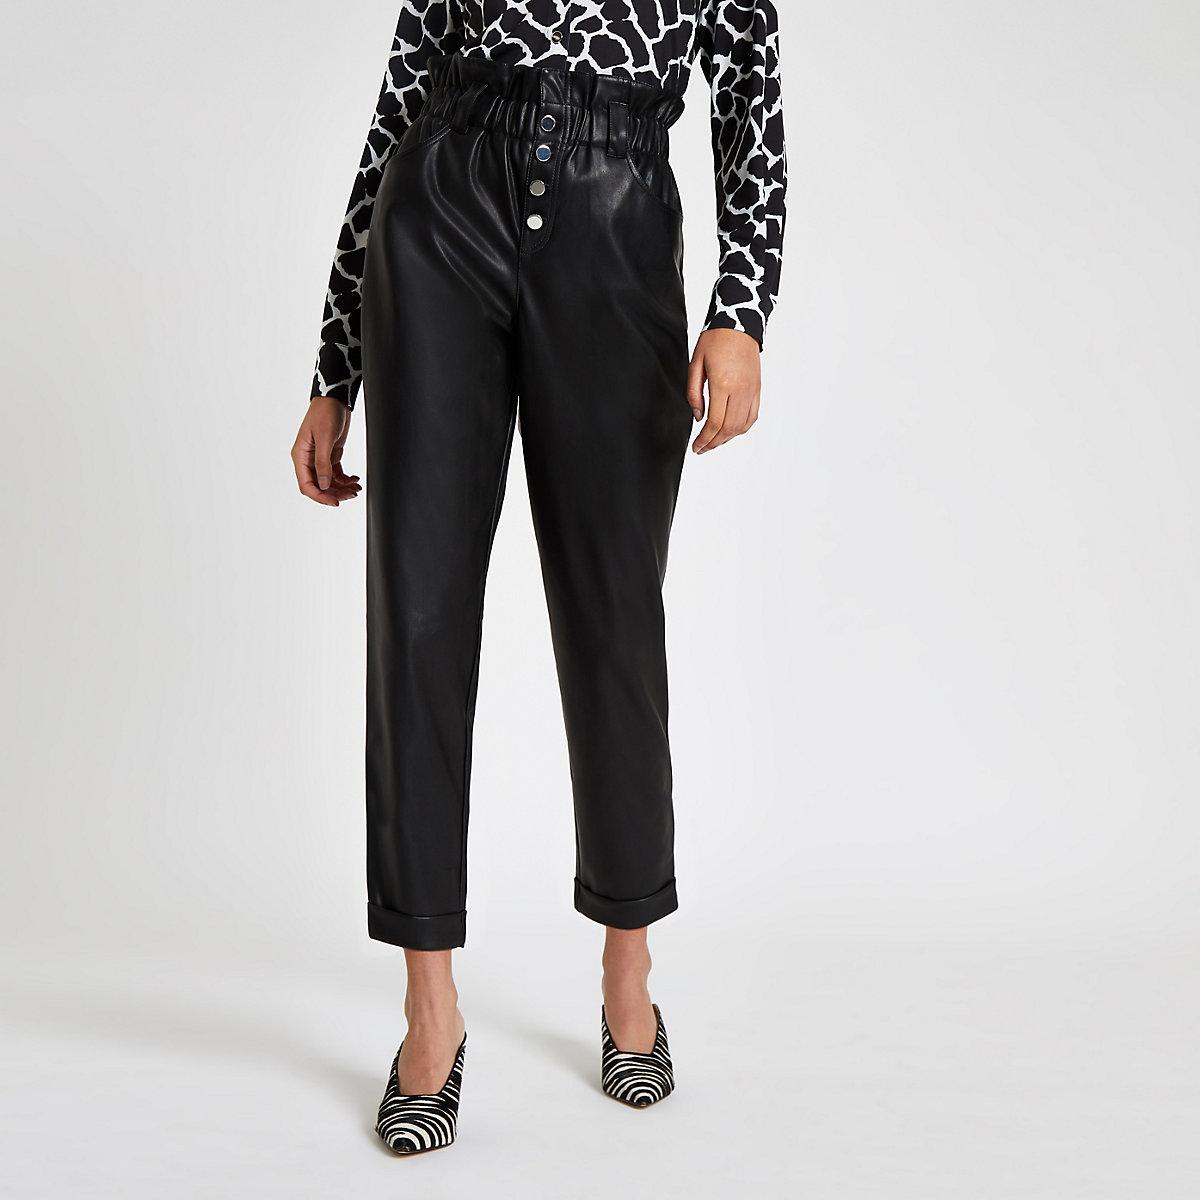 Black faux leather paperbag button pants